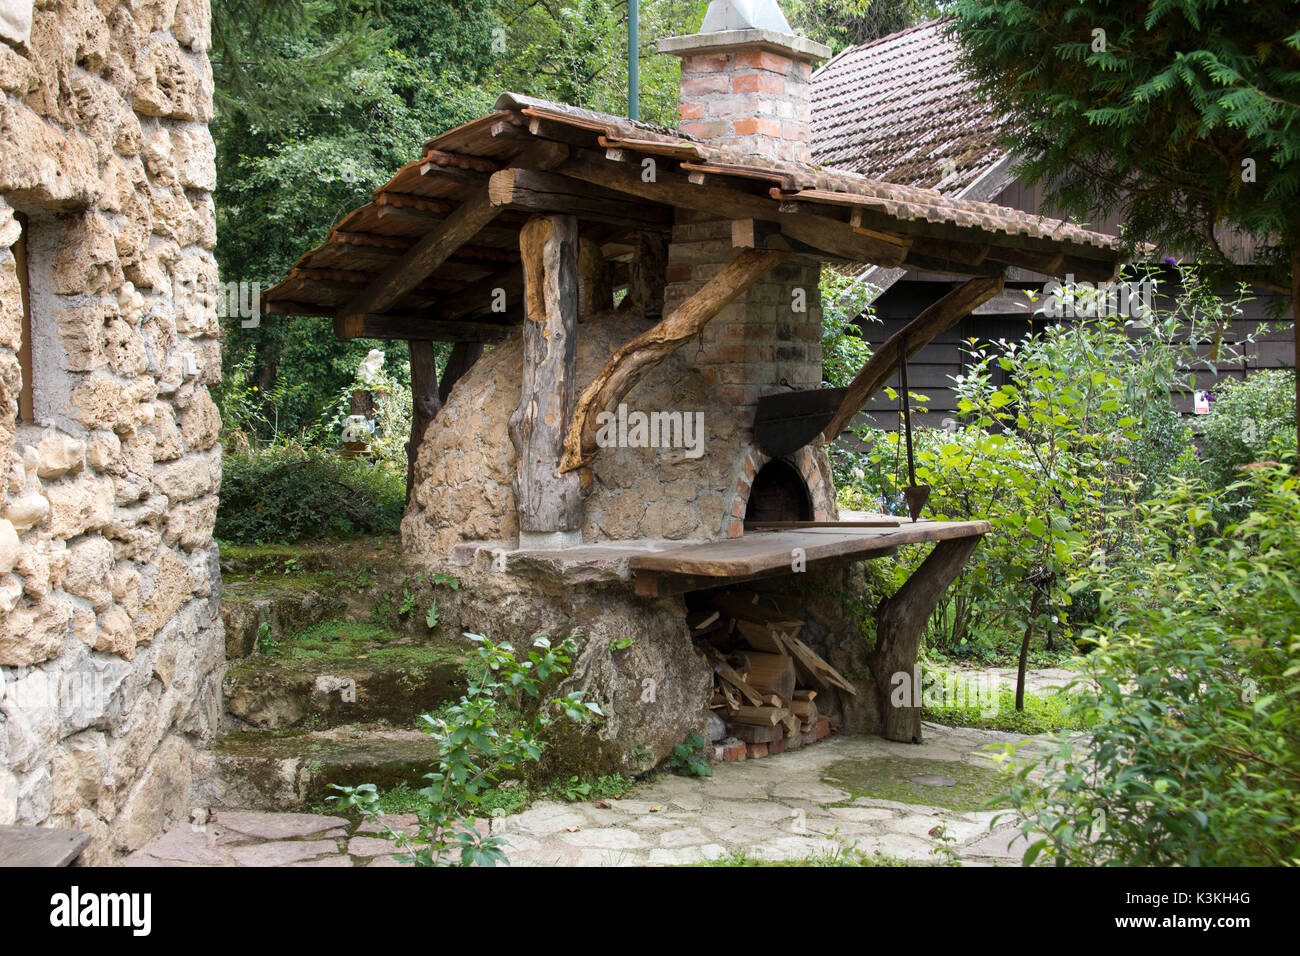 Outdoor Küche Holzofen : Outdoor holzofen zum brotbacken stockfoto bild: 157167824 alamy